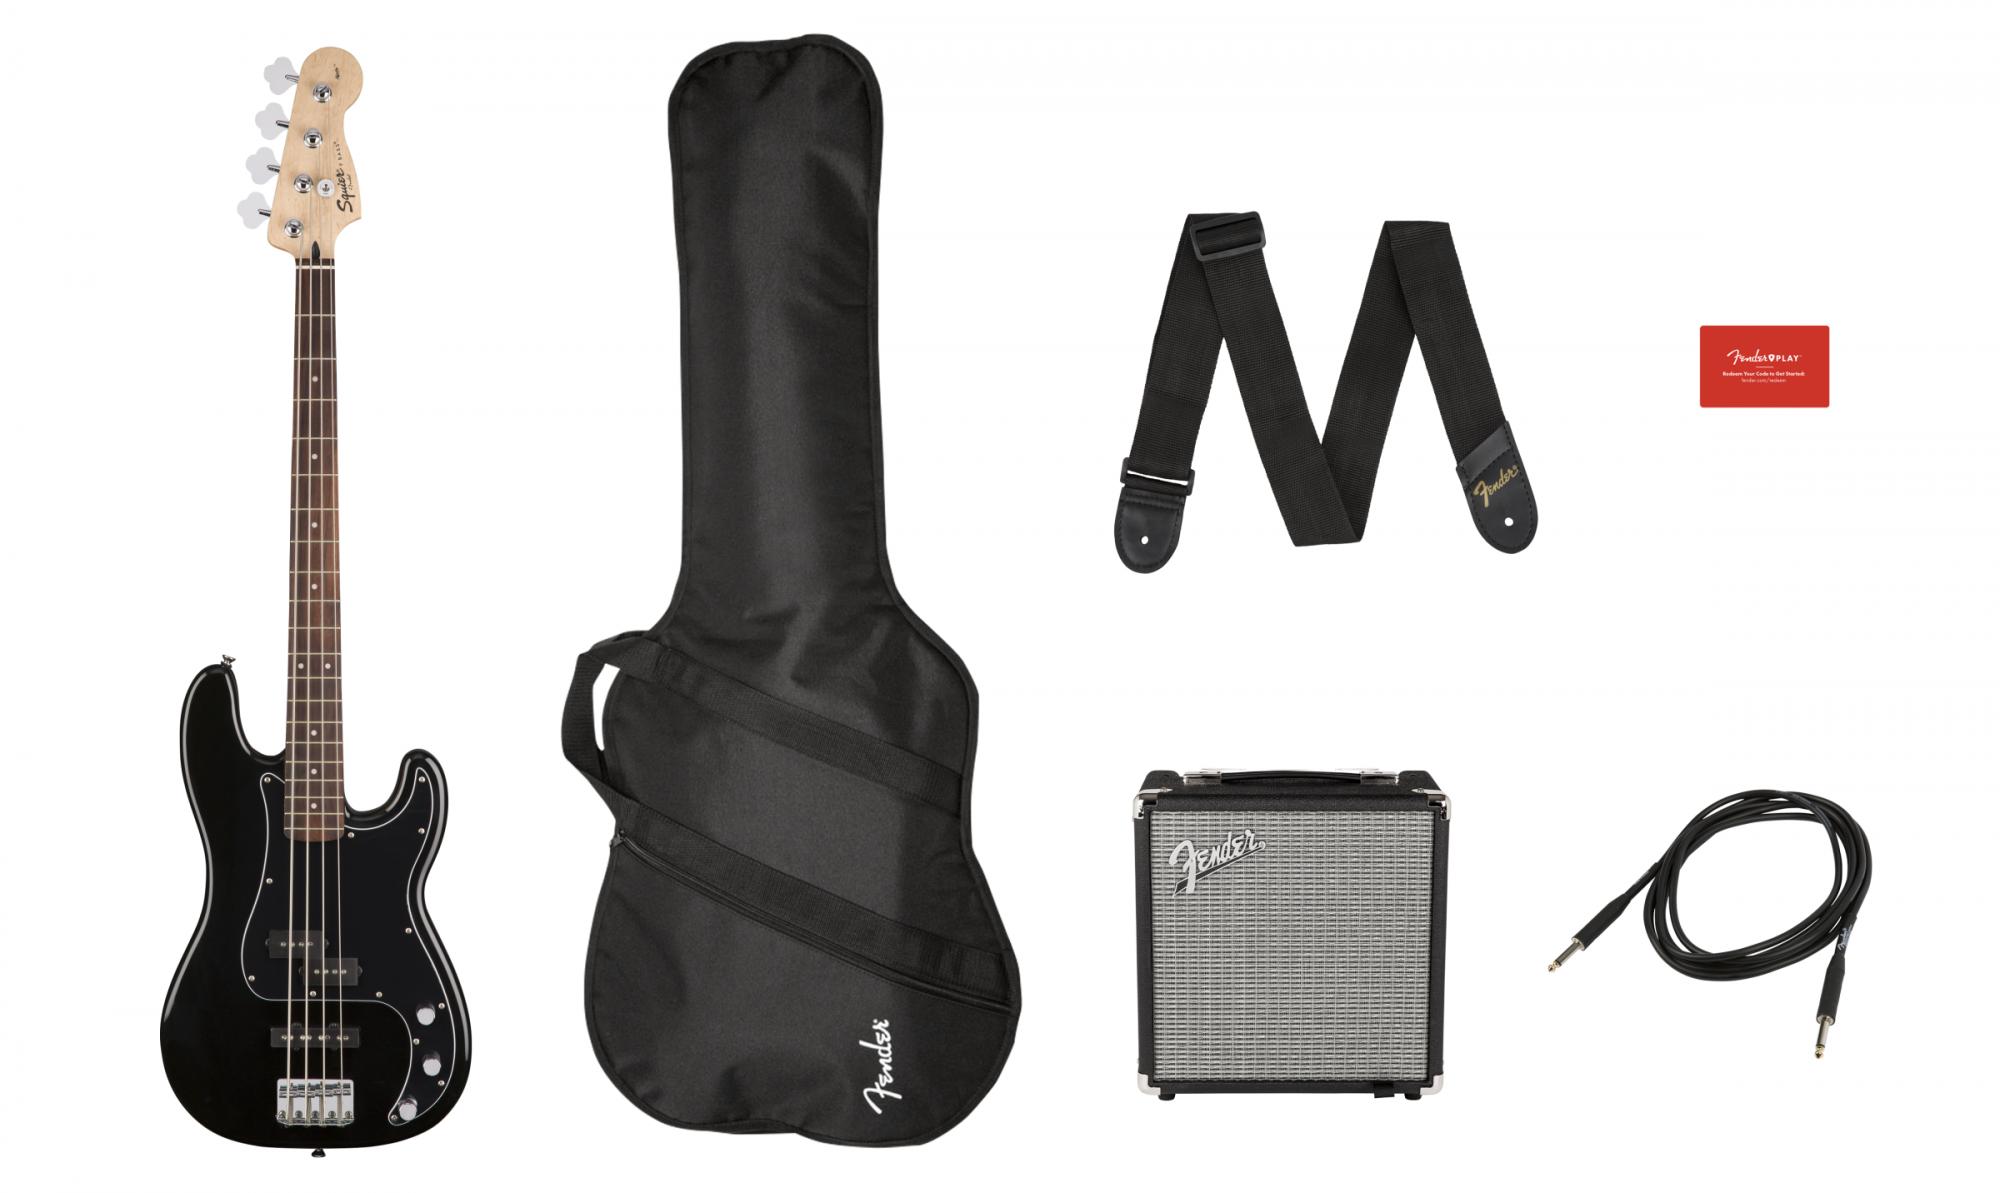 Squier Affinity Series Precision Bass PJ Pack, Laurel Fingerboard, Black, Gig Bag, Rumble 15 - 220V AR